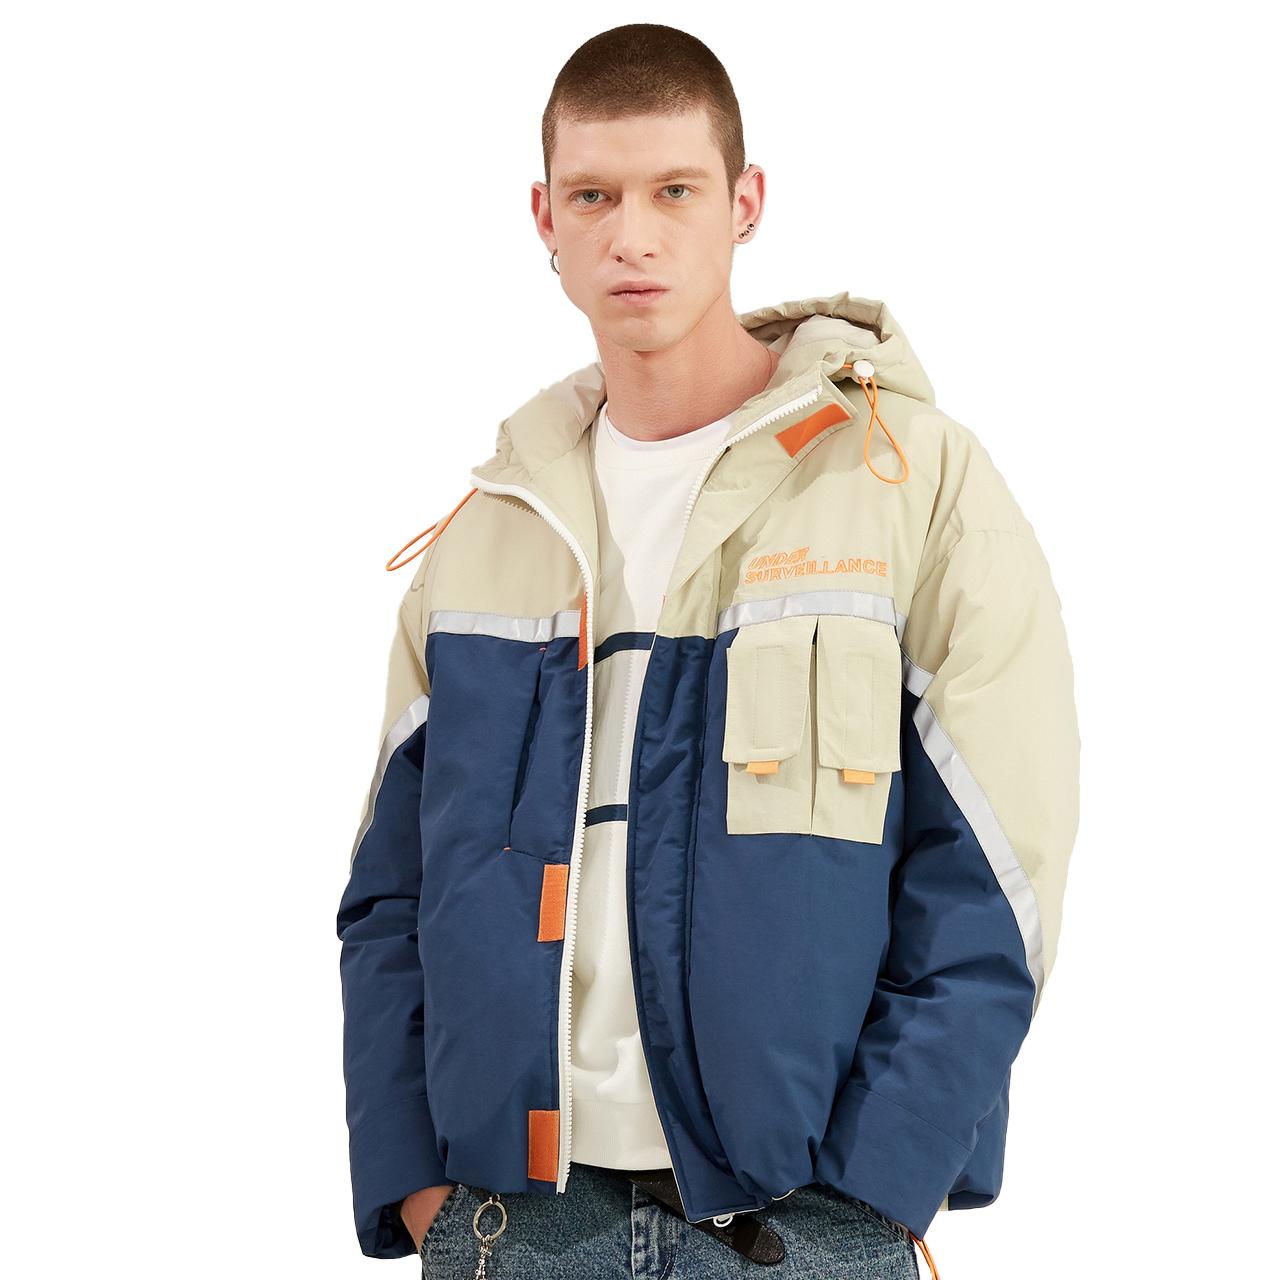 LILBETTER T-9184-019004 男士连帽棉服夹克